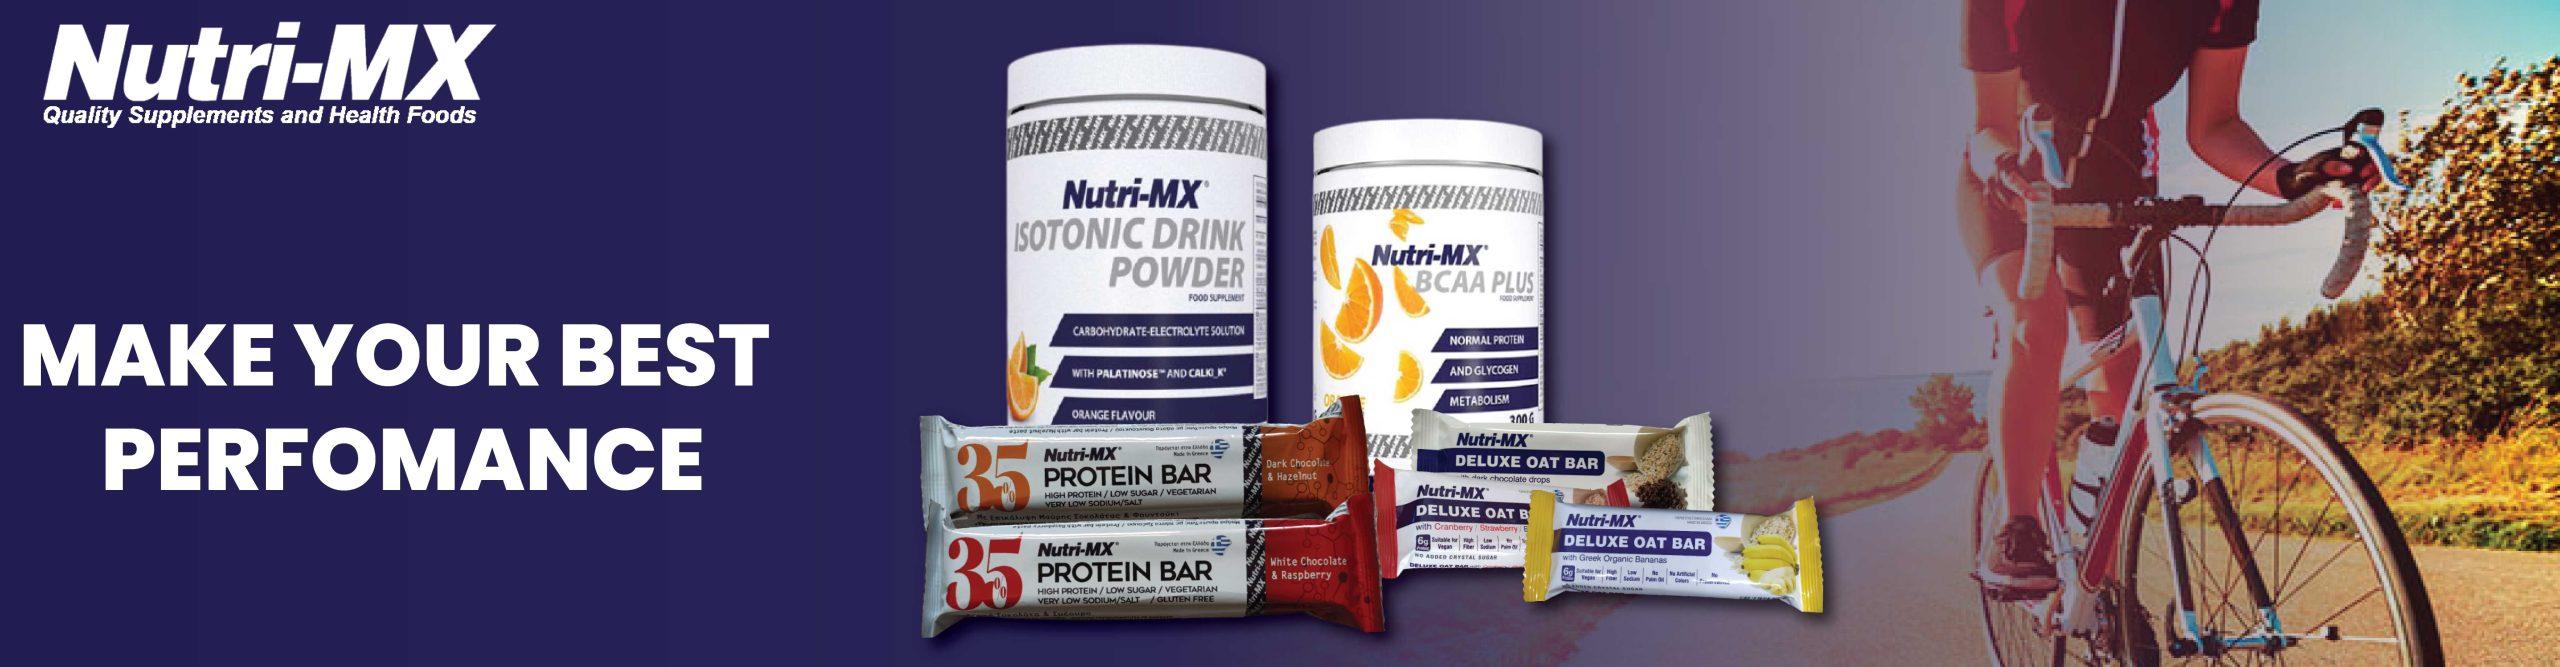 Nutri-MX-Performance-Banner-web